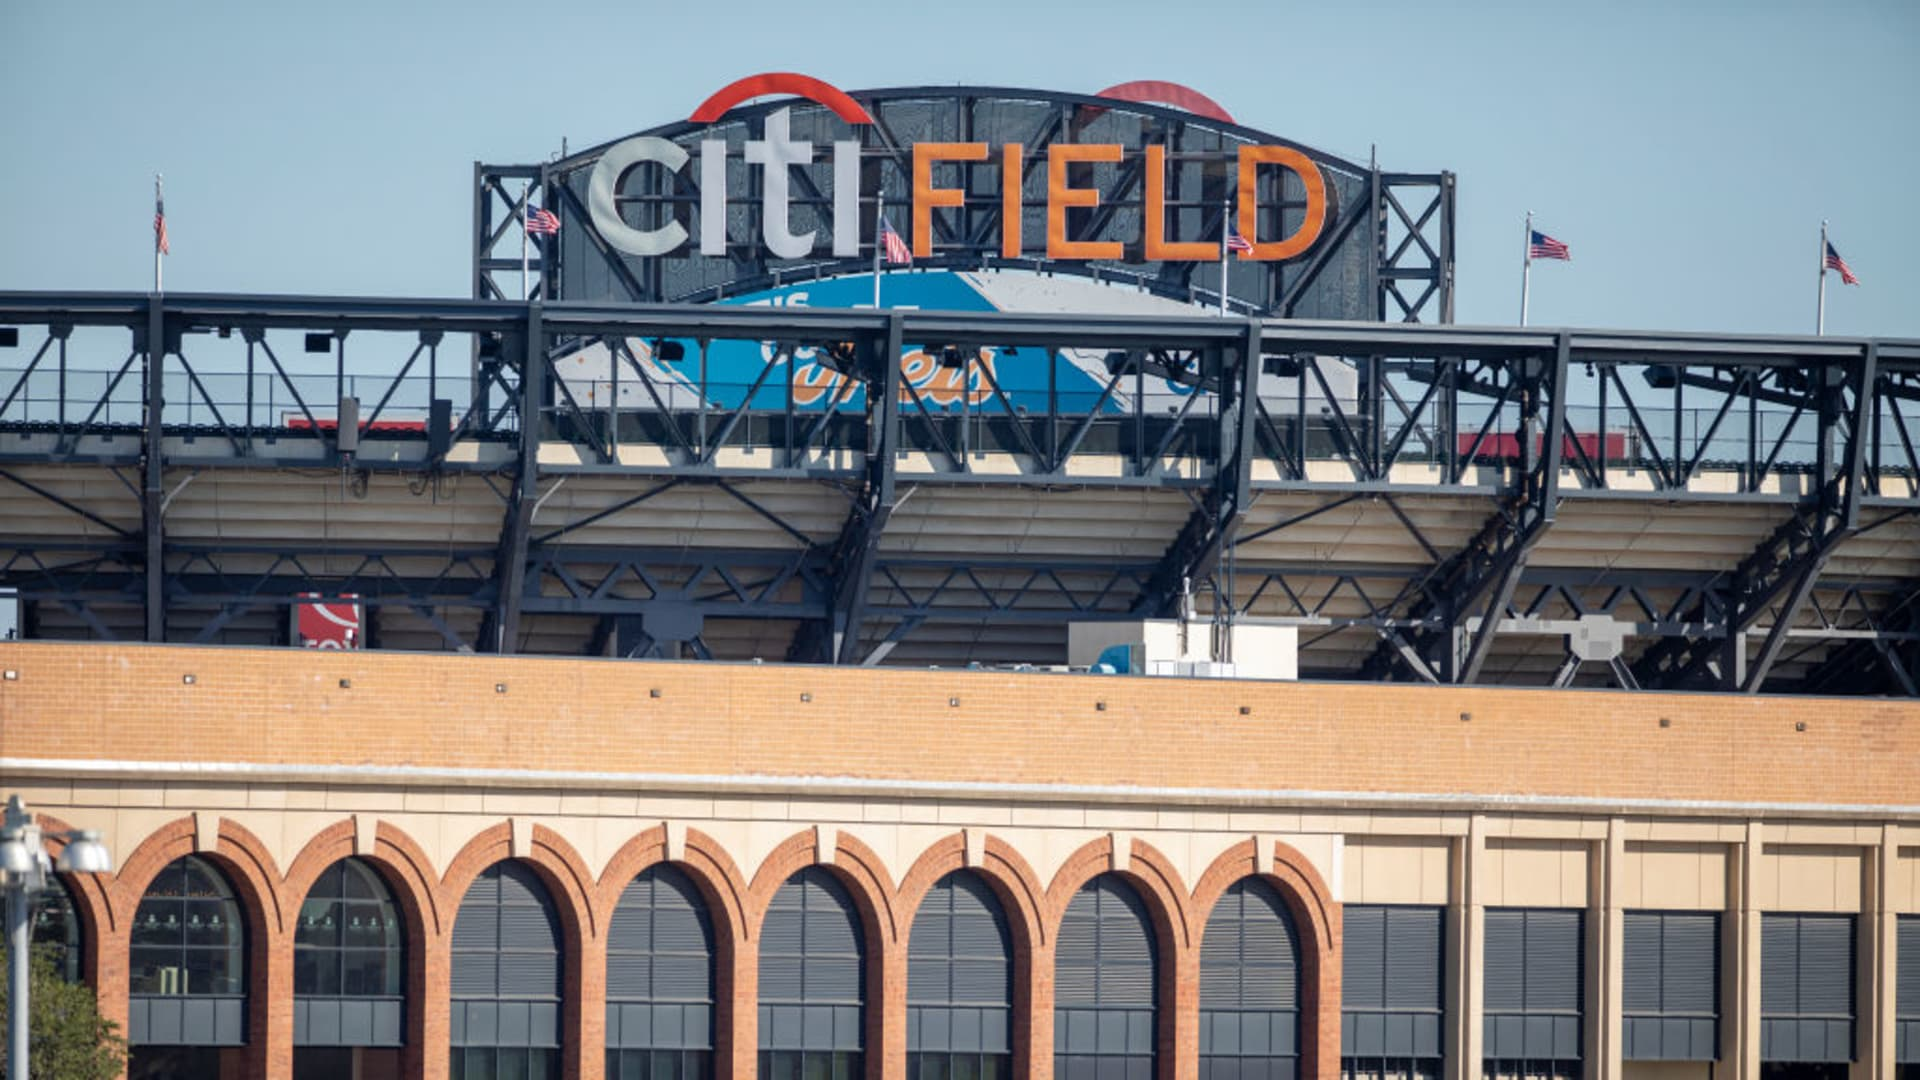 Citi field baseball stadium, home of the New York Mets Major League Baseball team on September 7th, 2019 in Flushing, Queens, New York City.